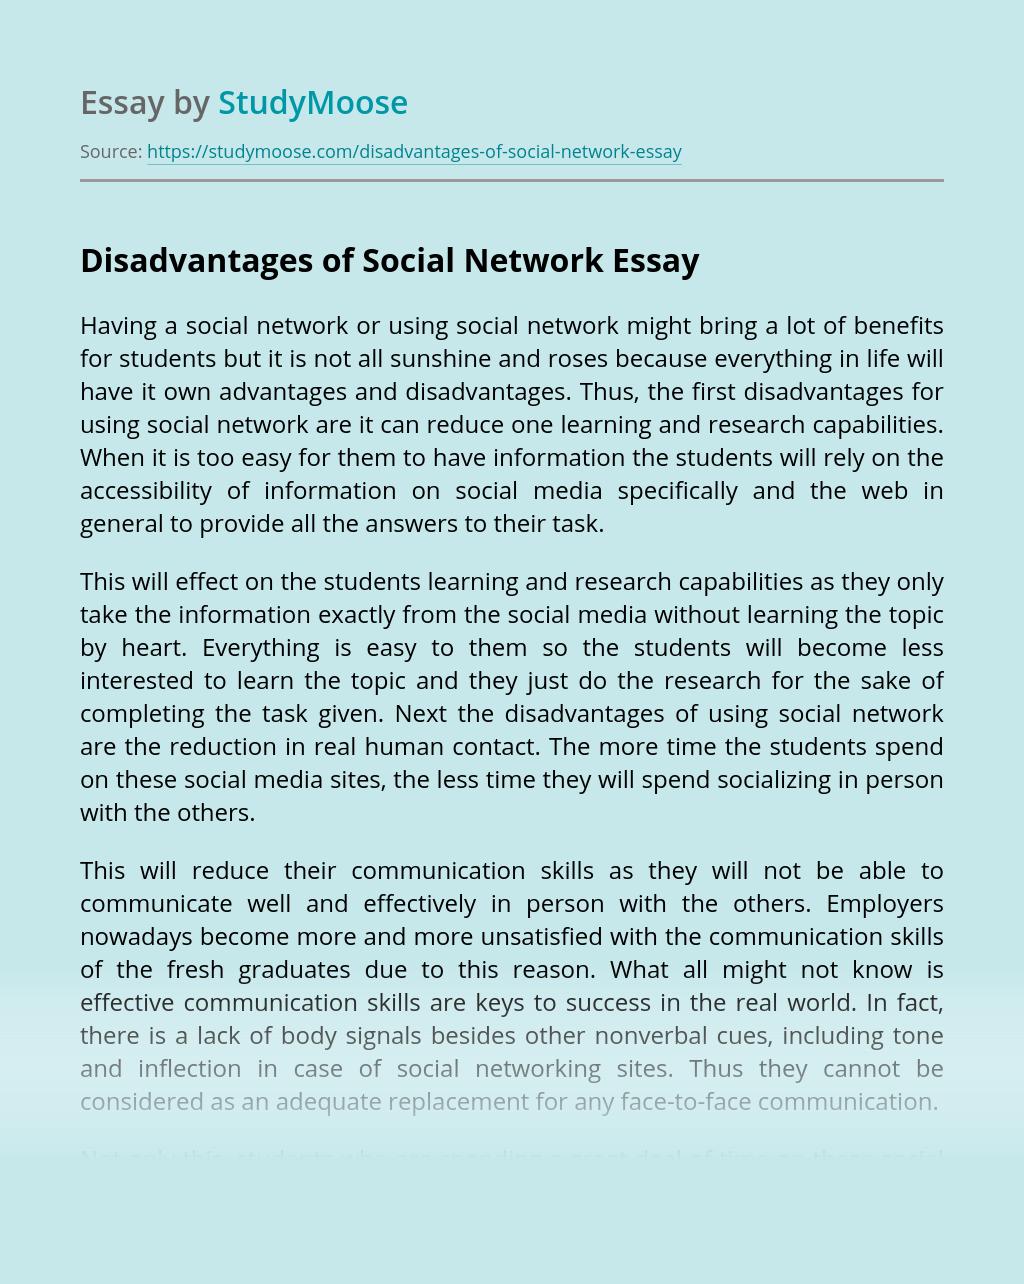 Disadvantages of Social Network